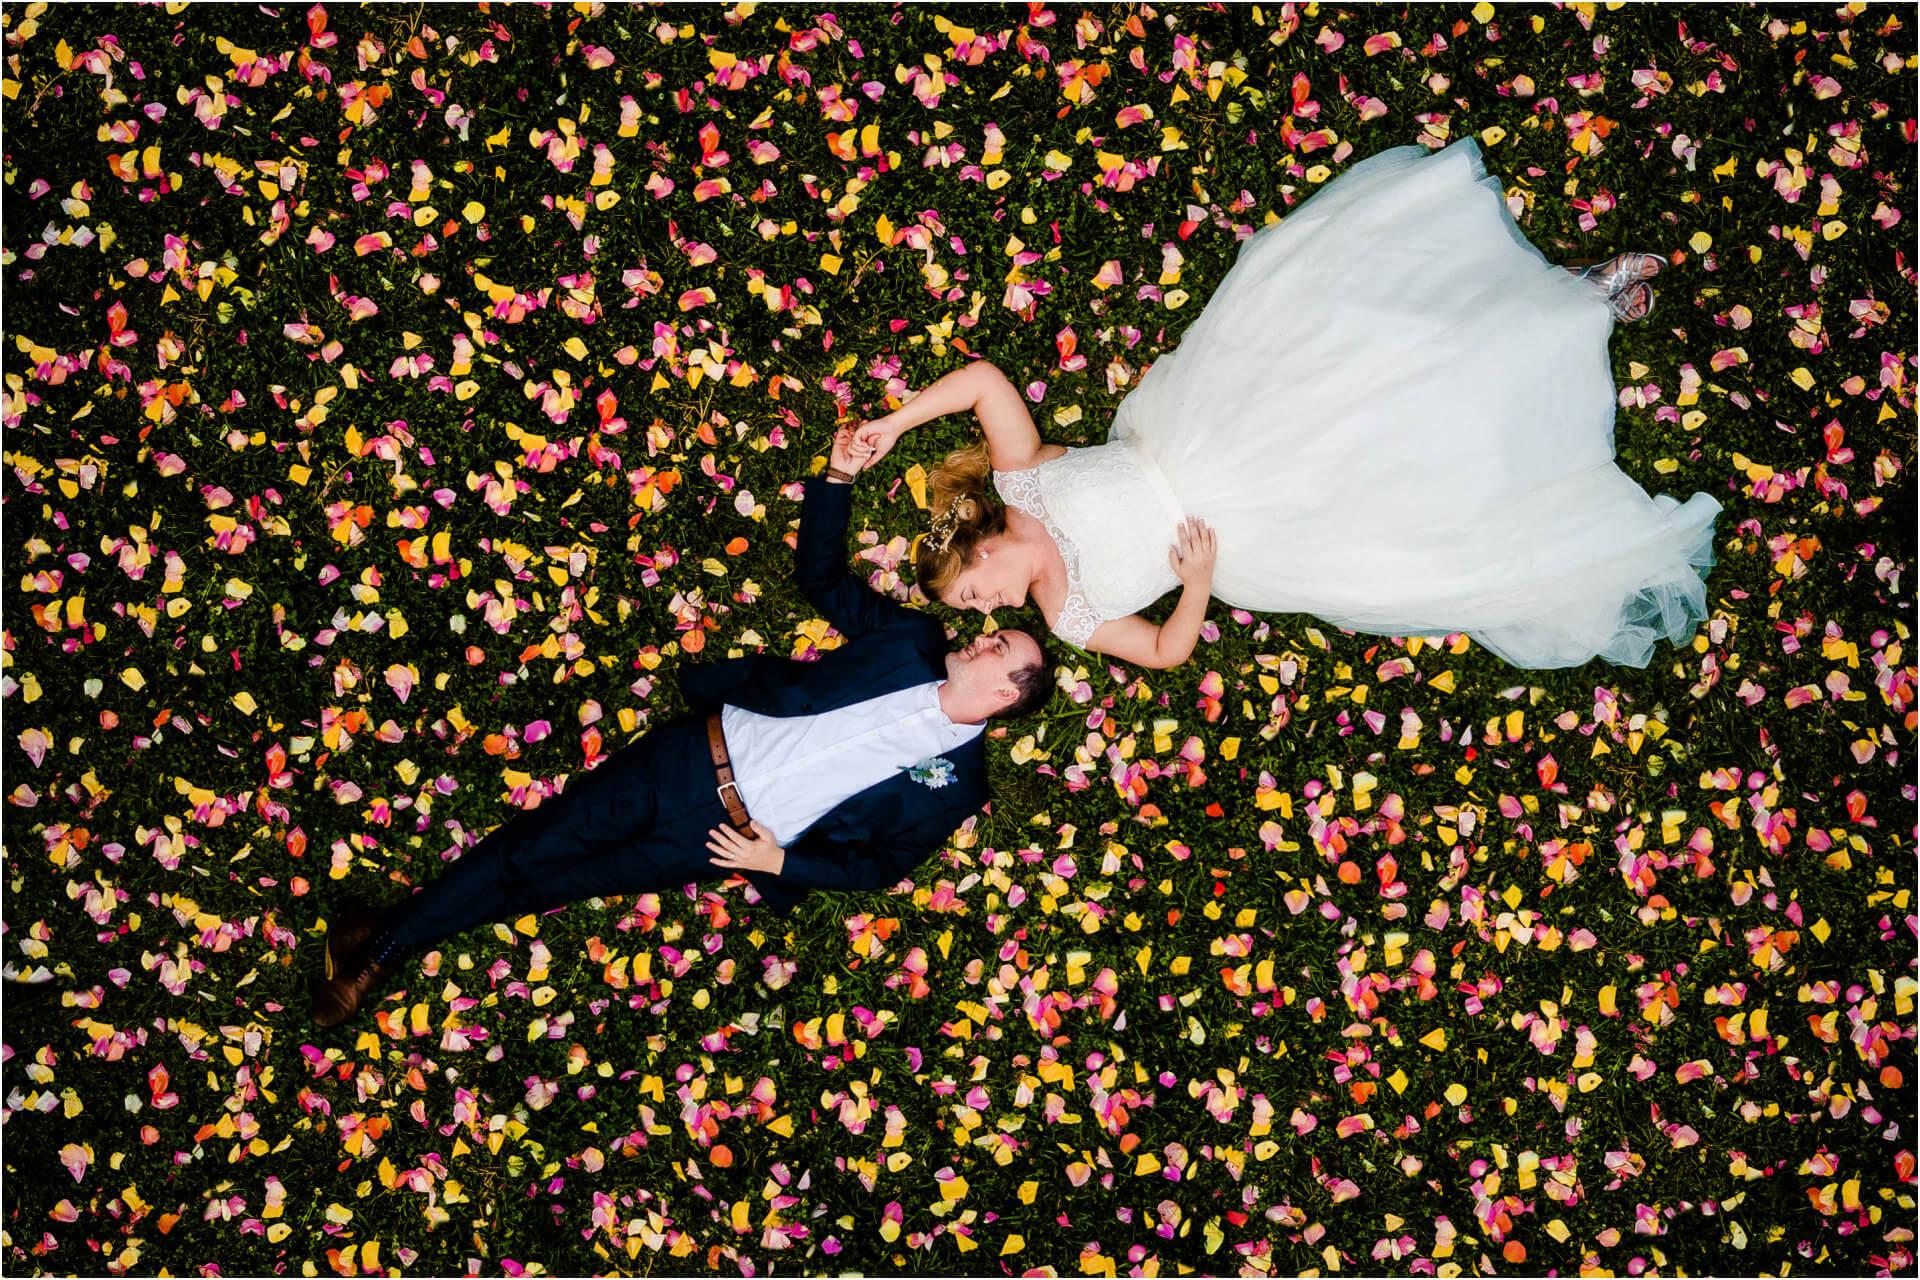 Drone Wedding Photography.Breathtaking Drone Wedding Photography 2019 Edition Dji